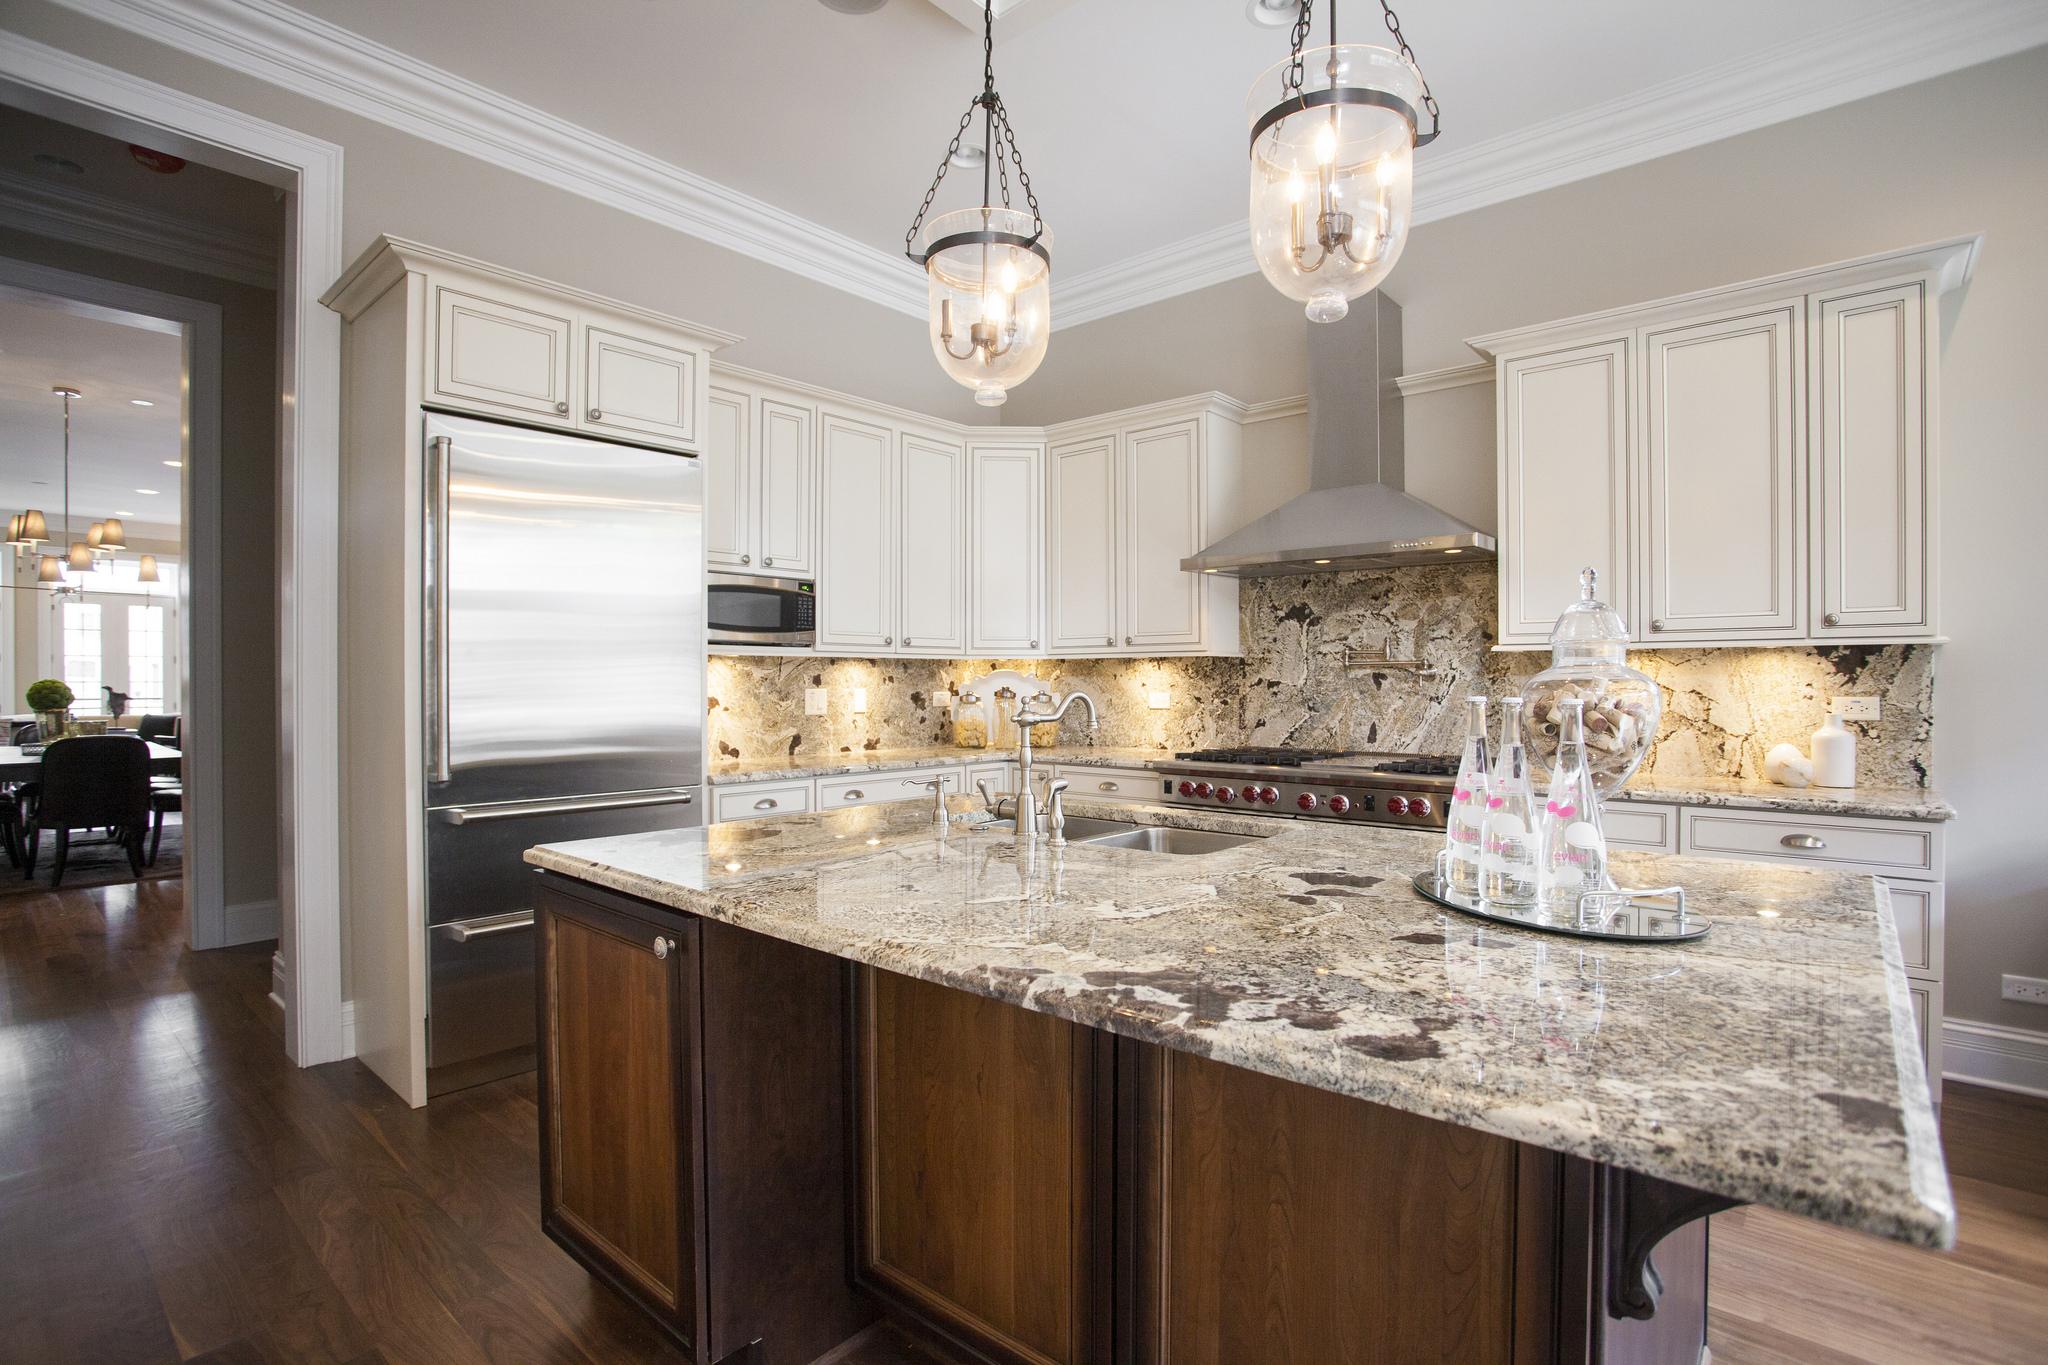 Basic Real Estate Photo Tips